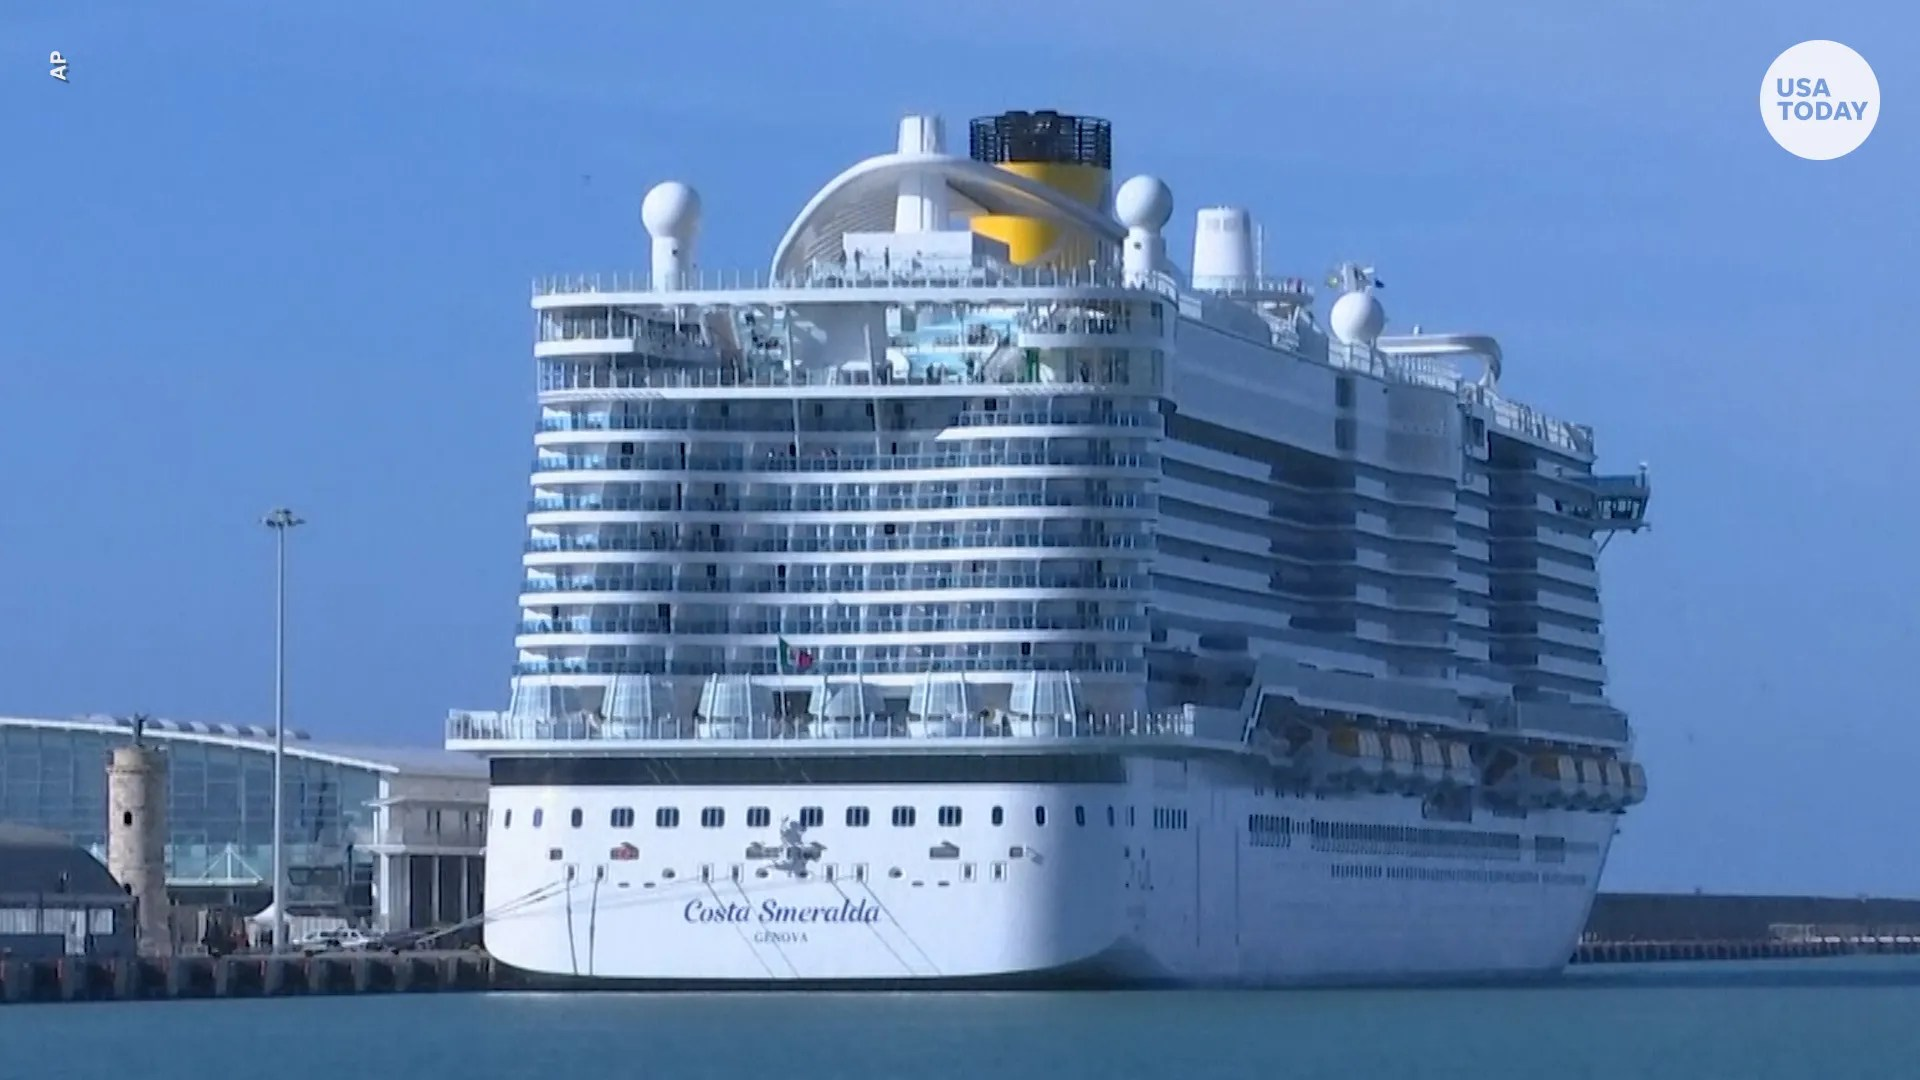 Coronavirus scare leaves 6,000 passengers stuck on cruise